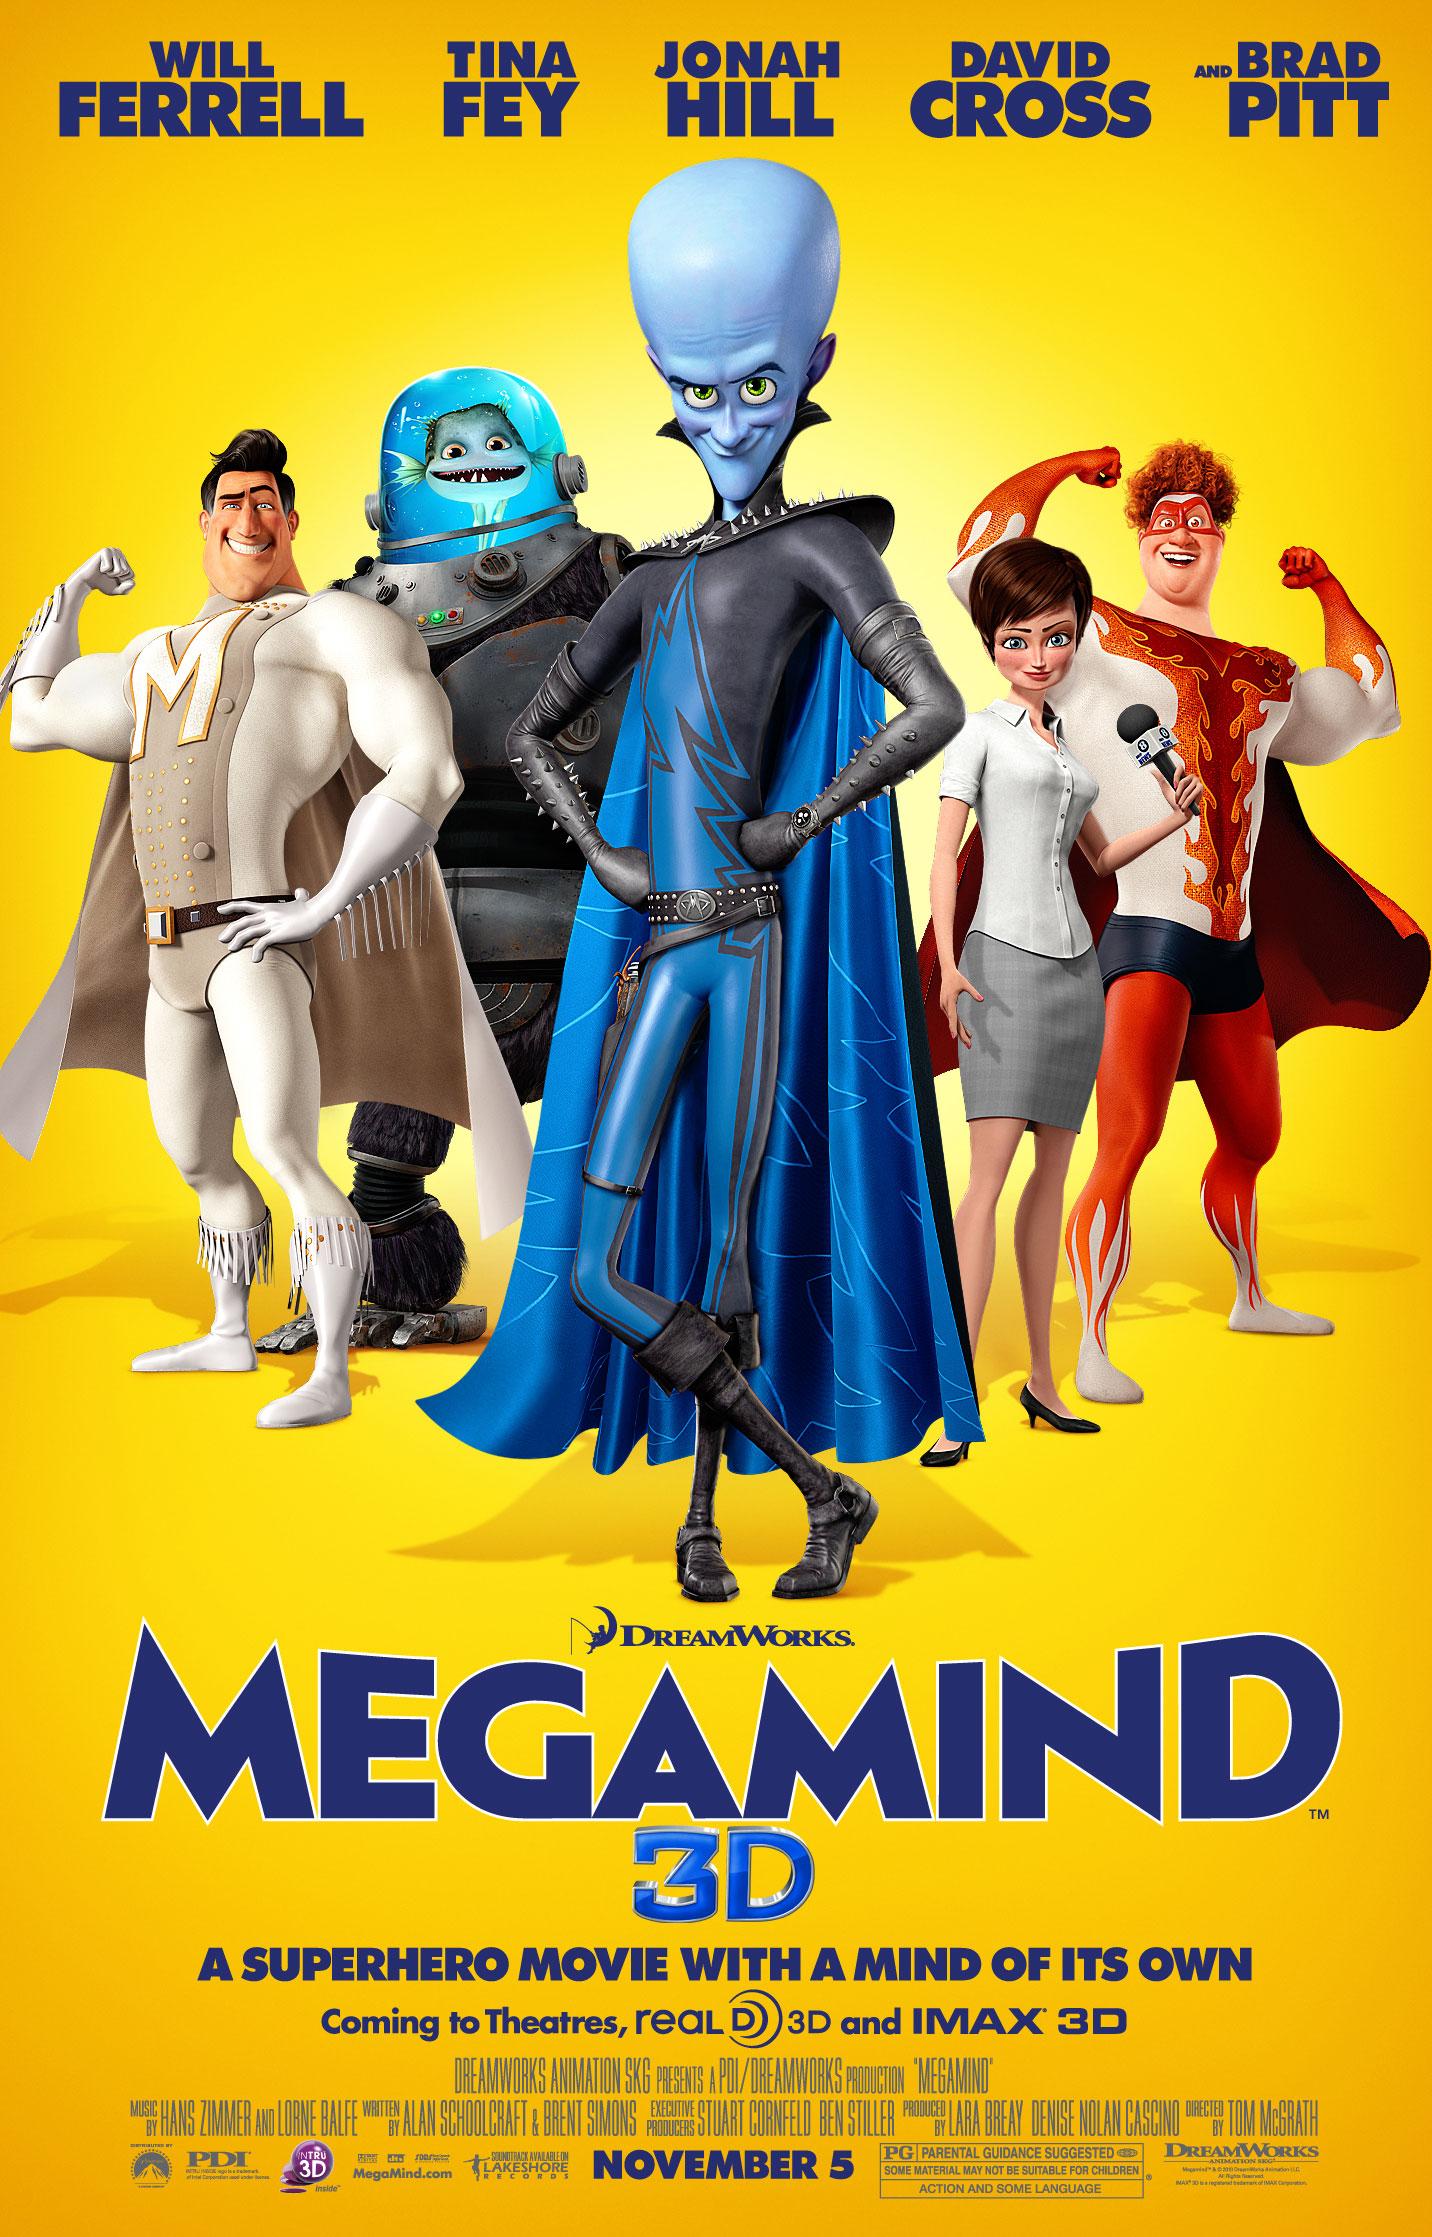 Megamind (film)/Gallery